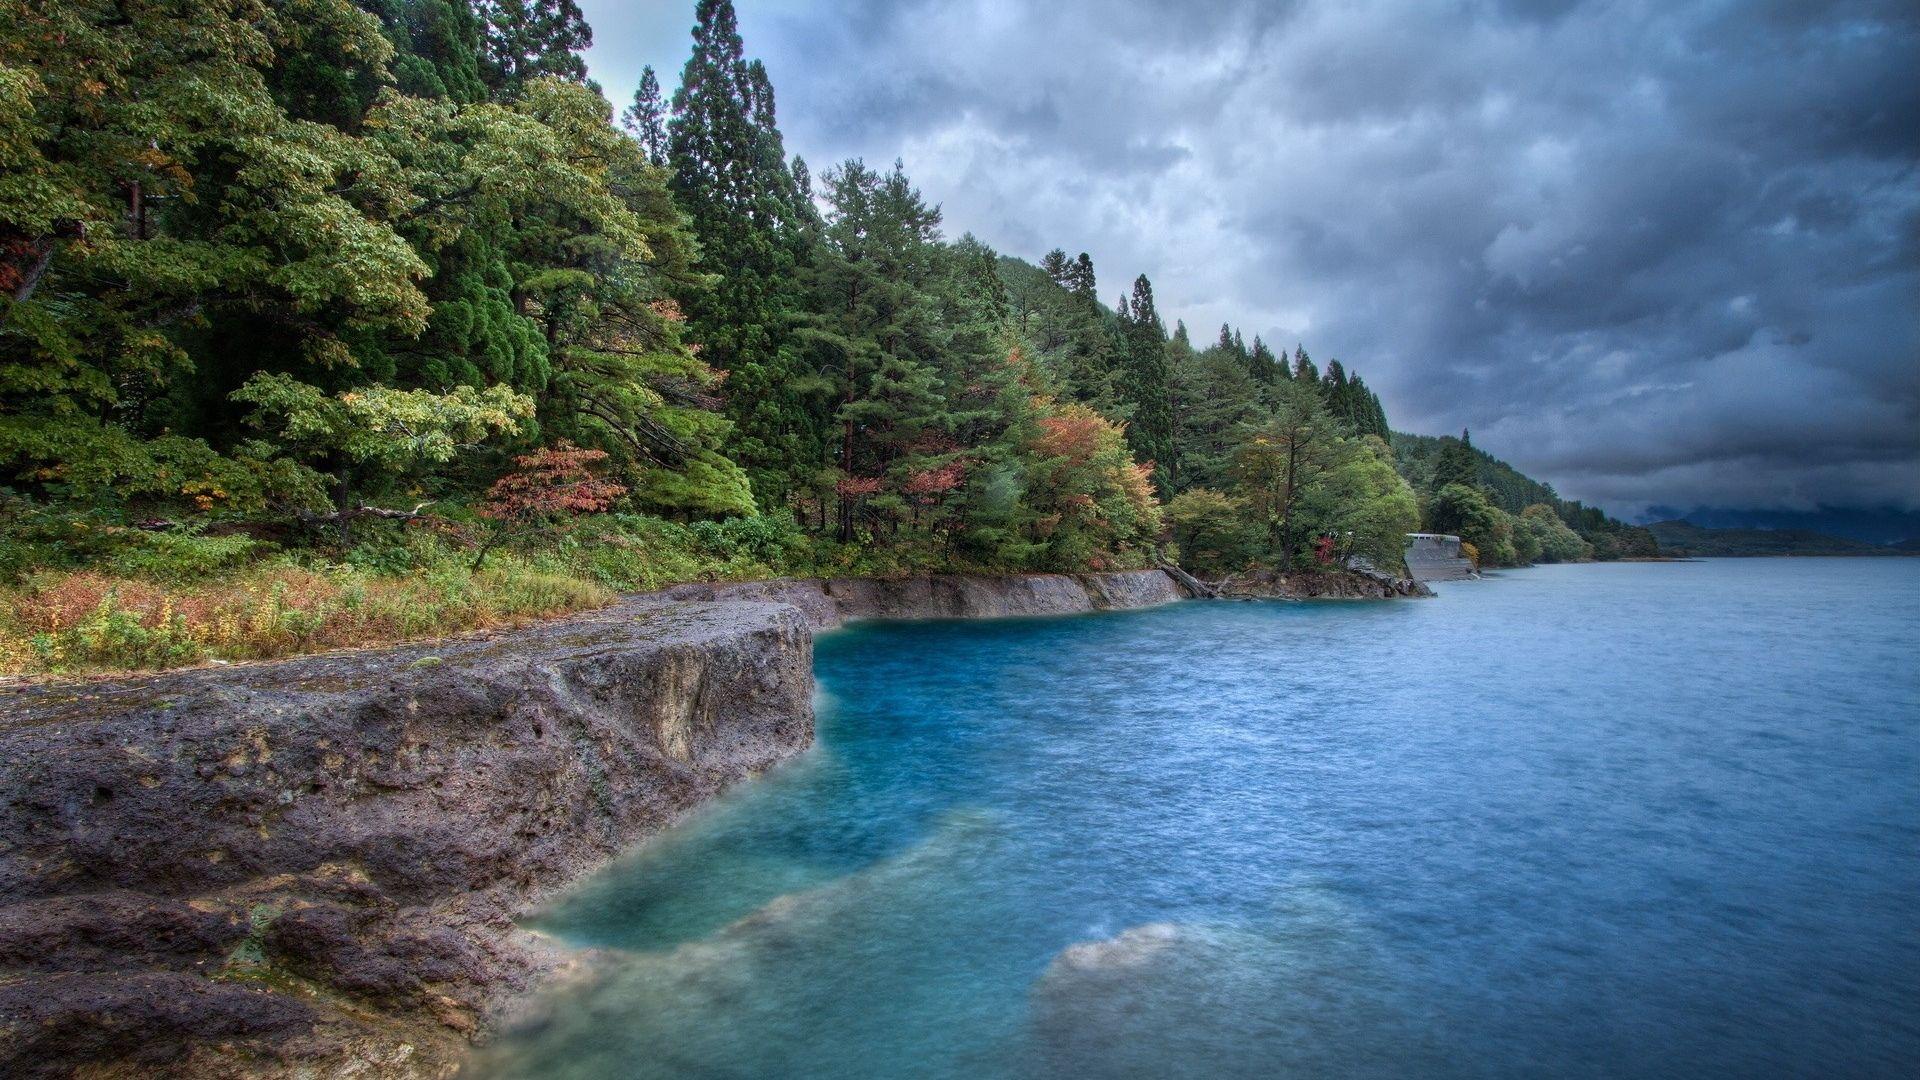 Nature Photo full hd image